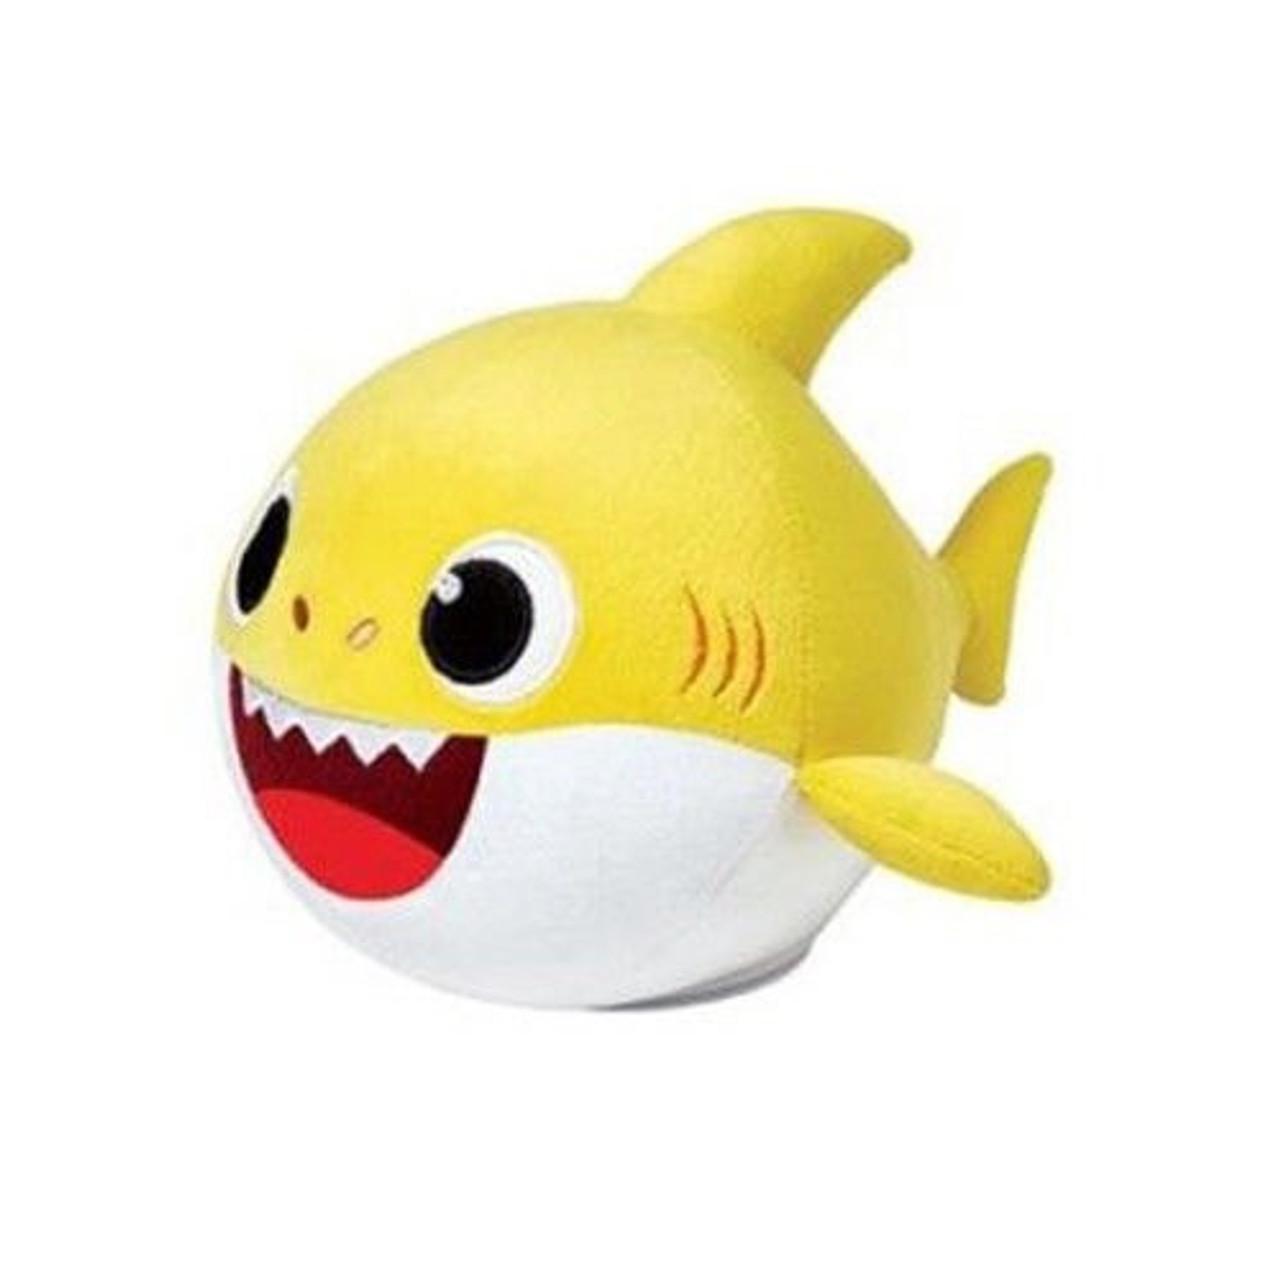 PINKFONG BABY SHARK DANCING BABY SHARK